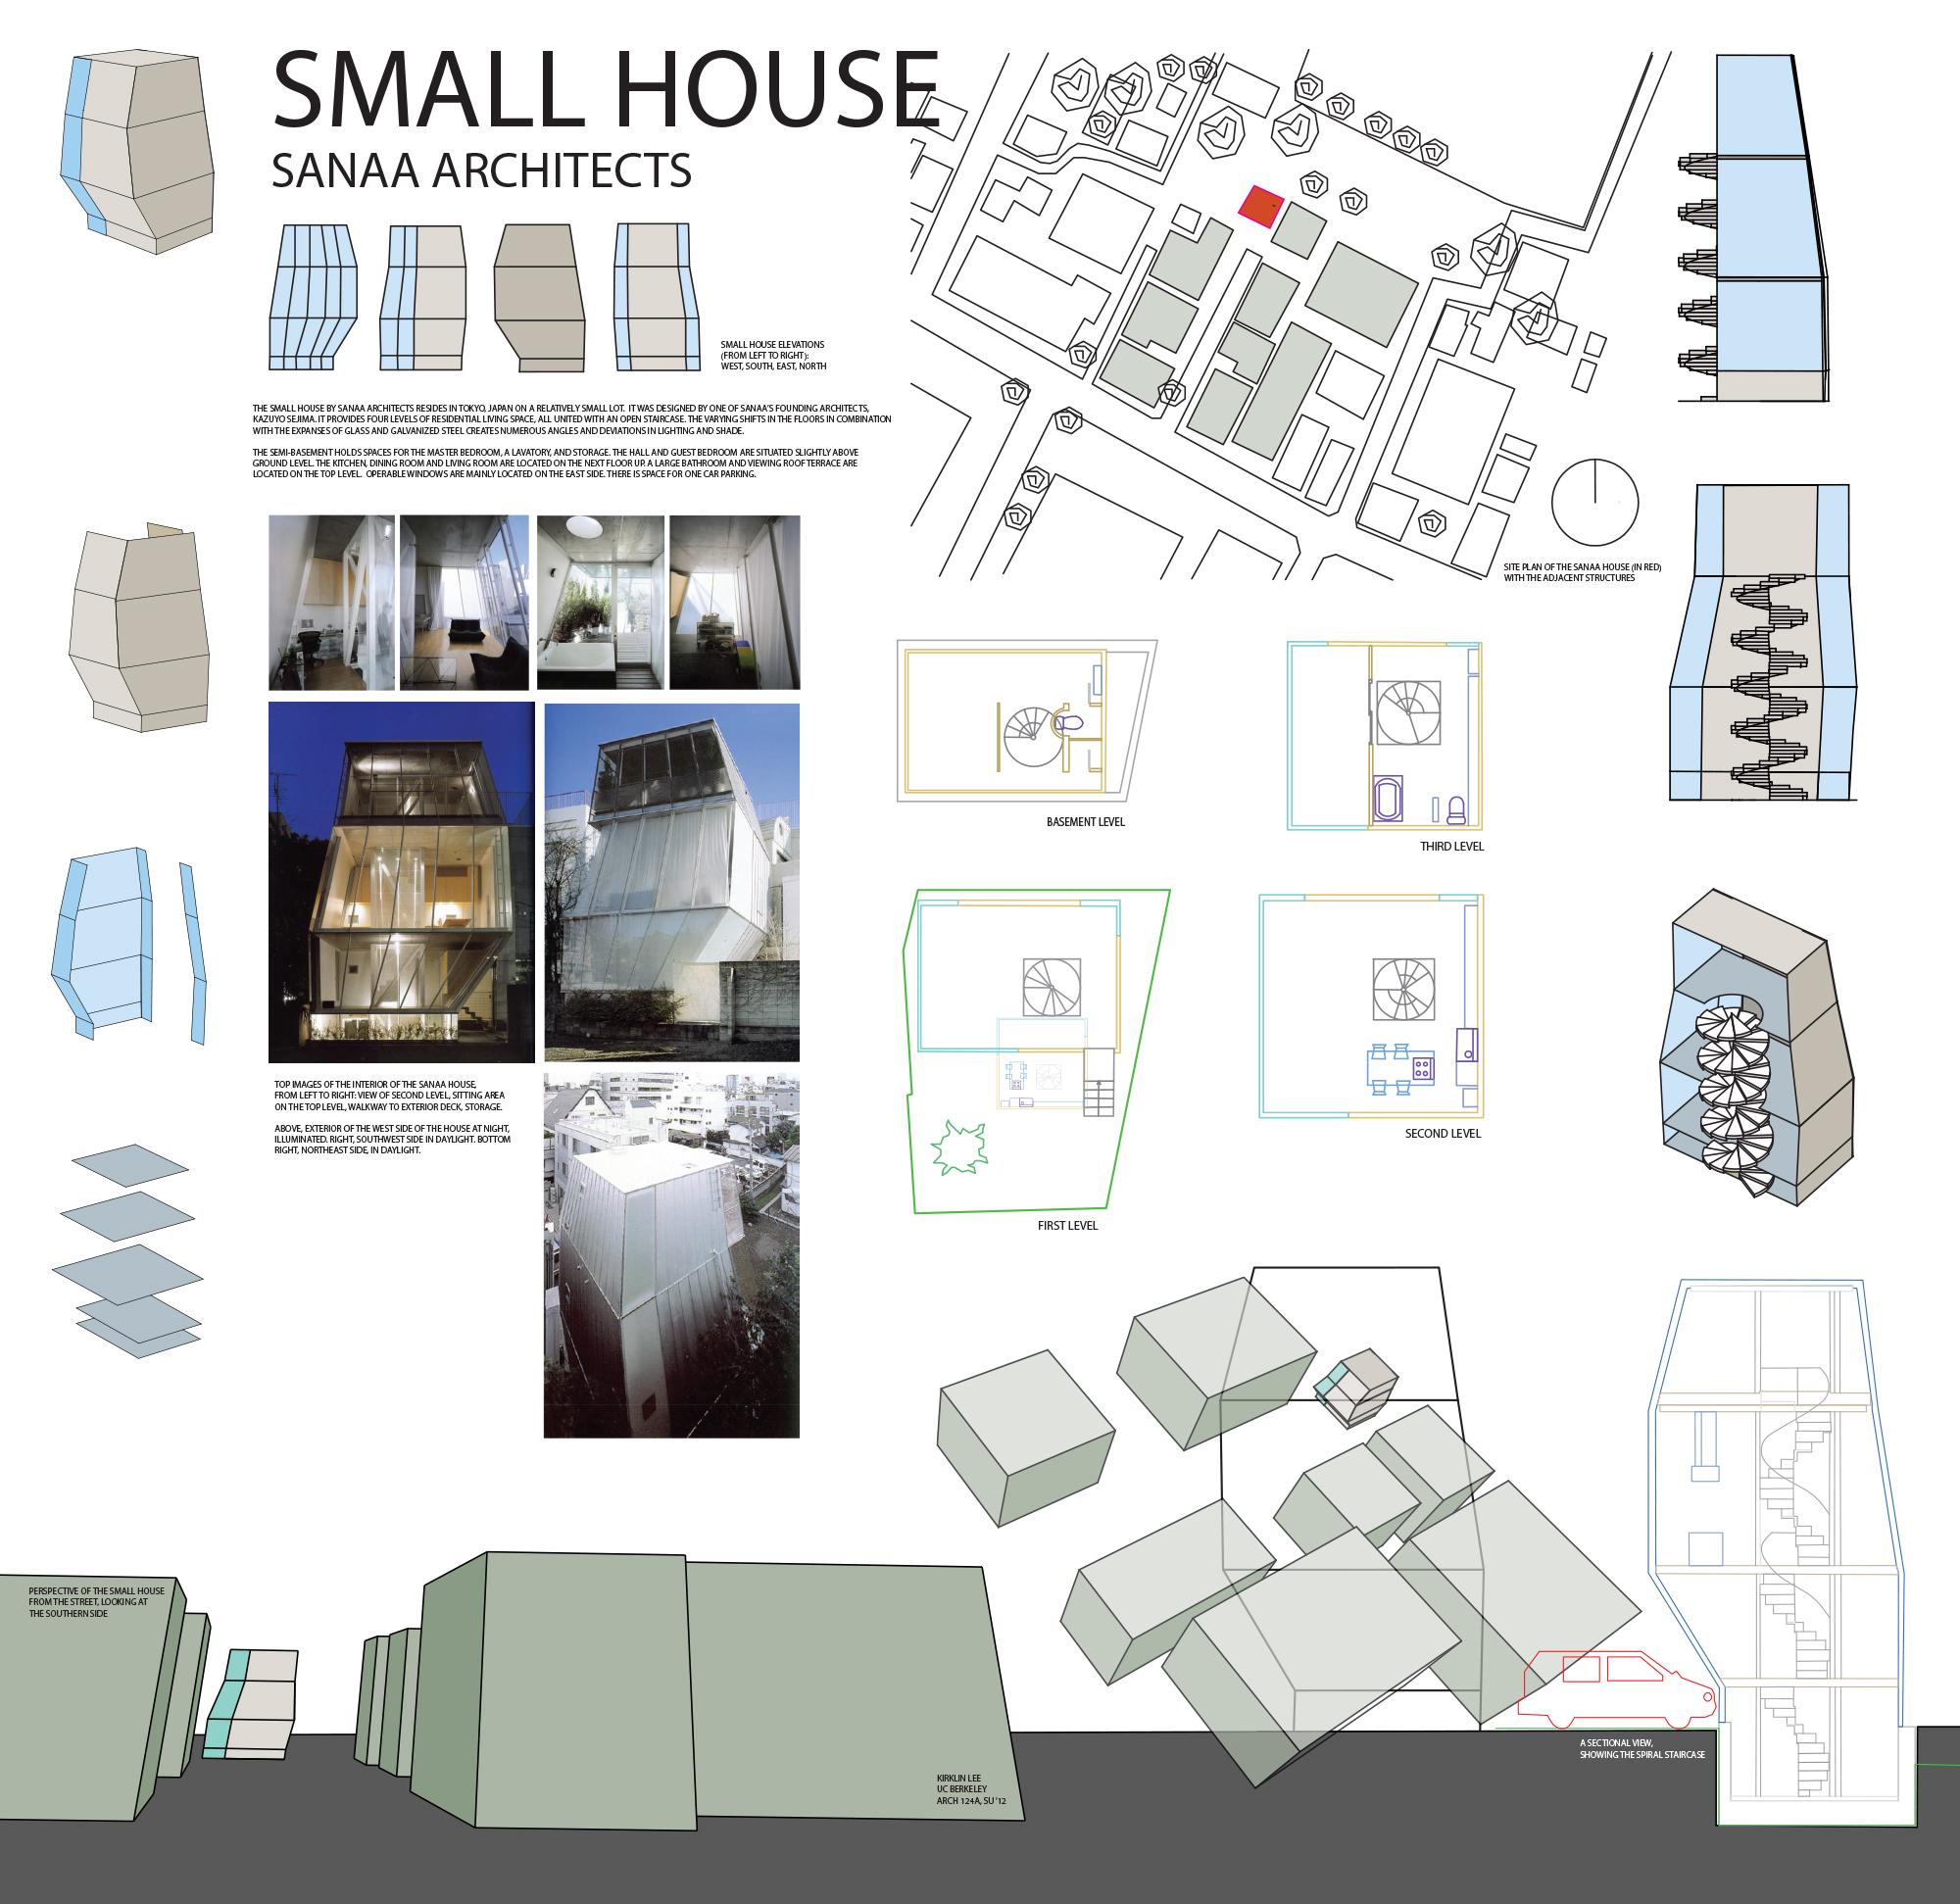 Small House, Sejima, Tania Carl, Arch 124A, UC Berkeley